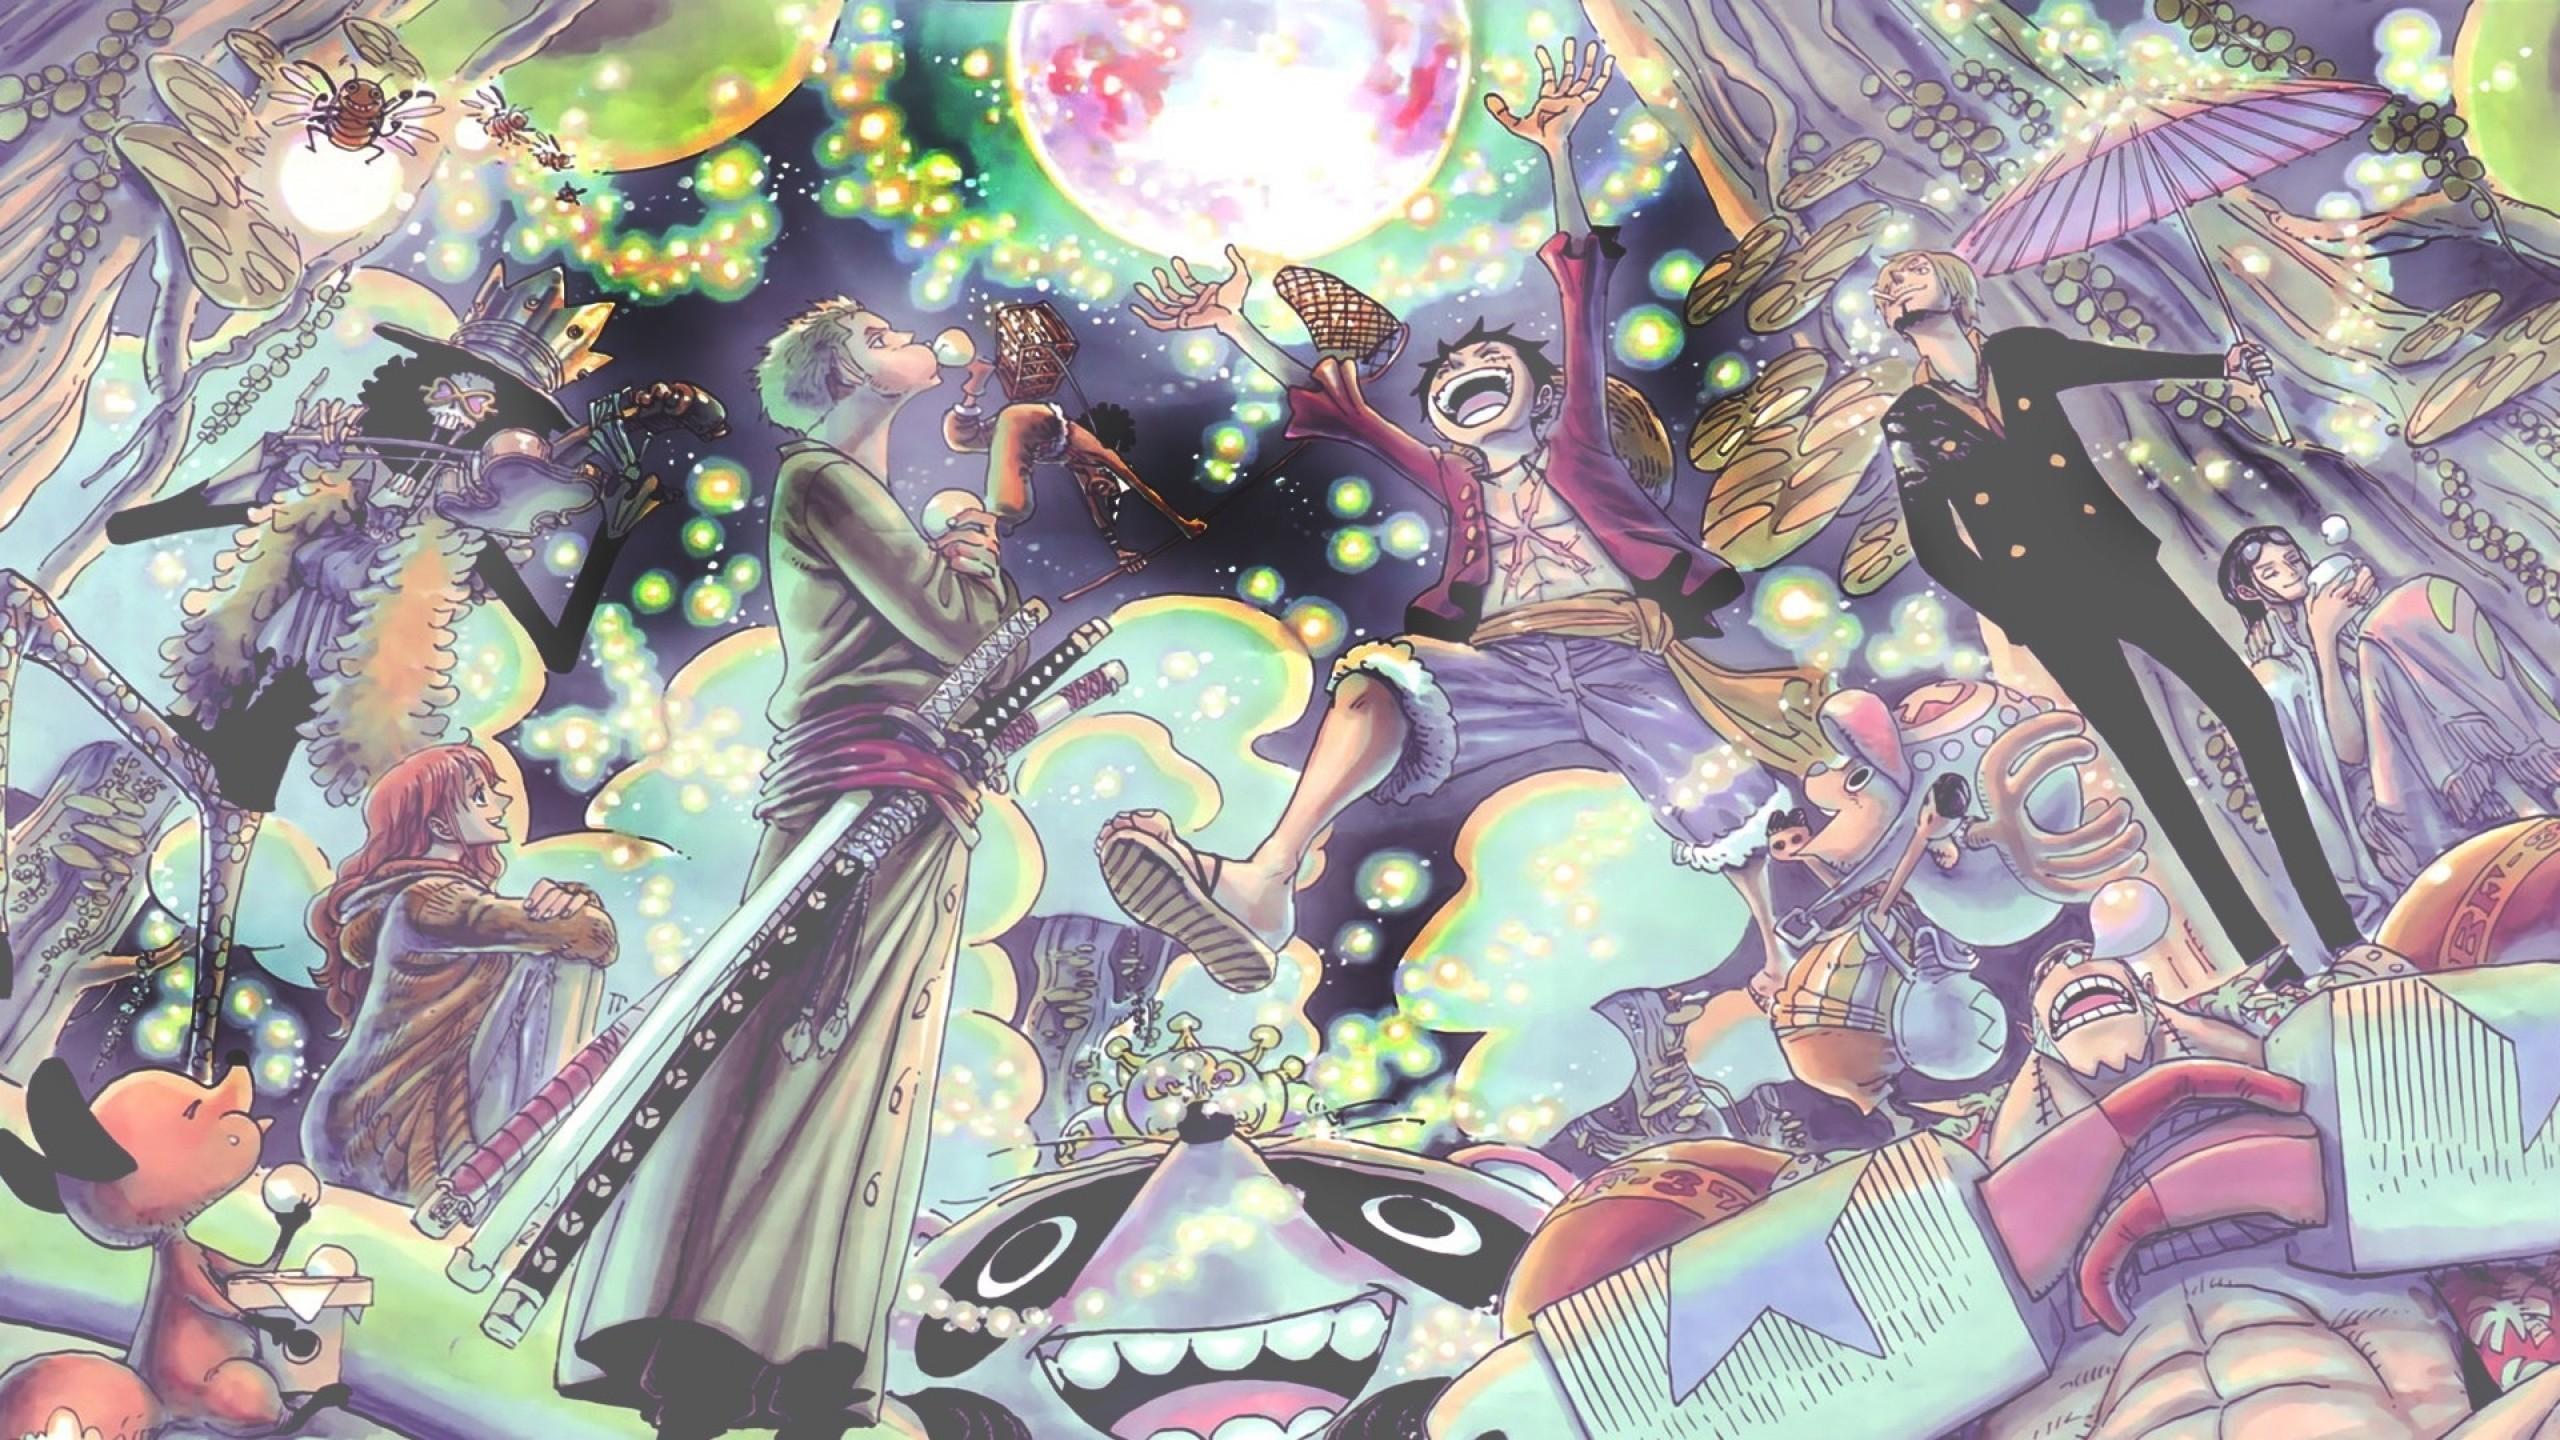 Illustration Anime One Piece Sanji Monkey D Luffy Comics Roronoa Zoro Nami Games Screenshot Comic Book